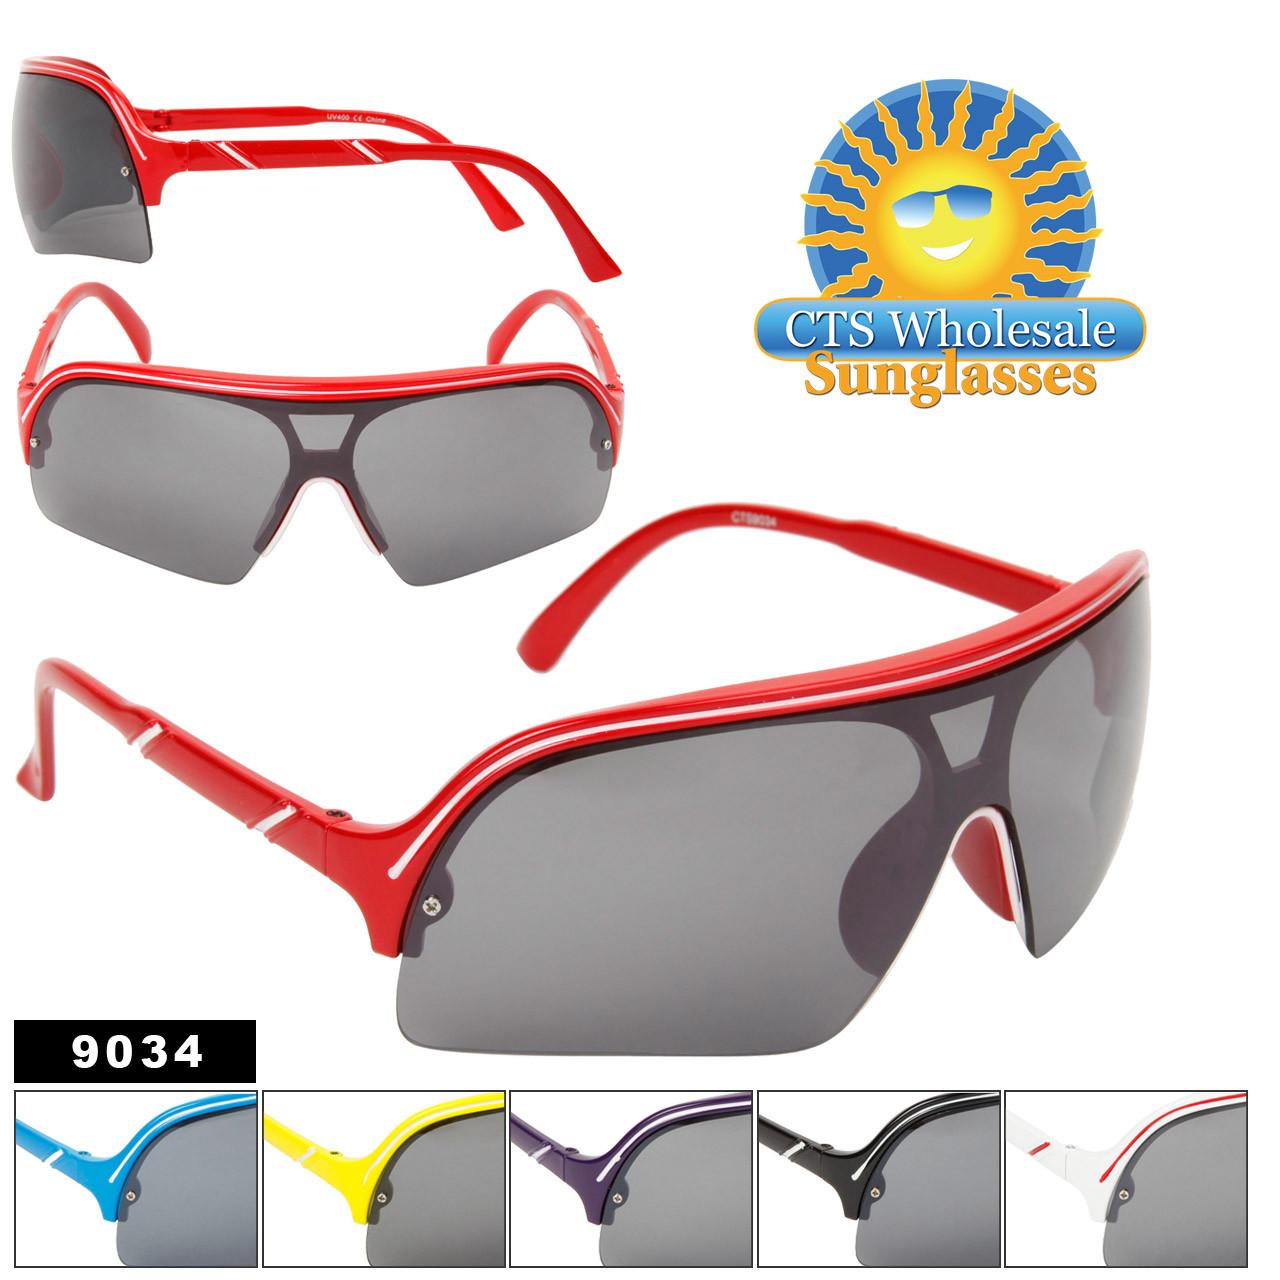 Single Piece Lens Sunglasses #9034